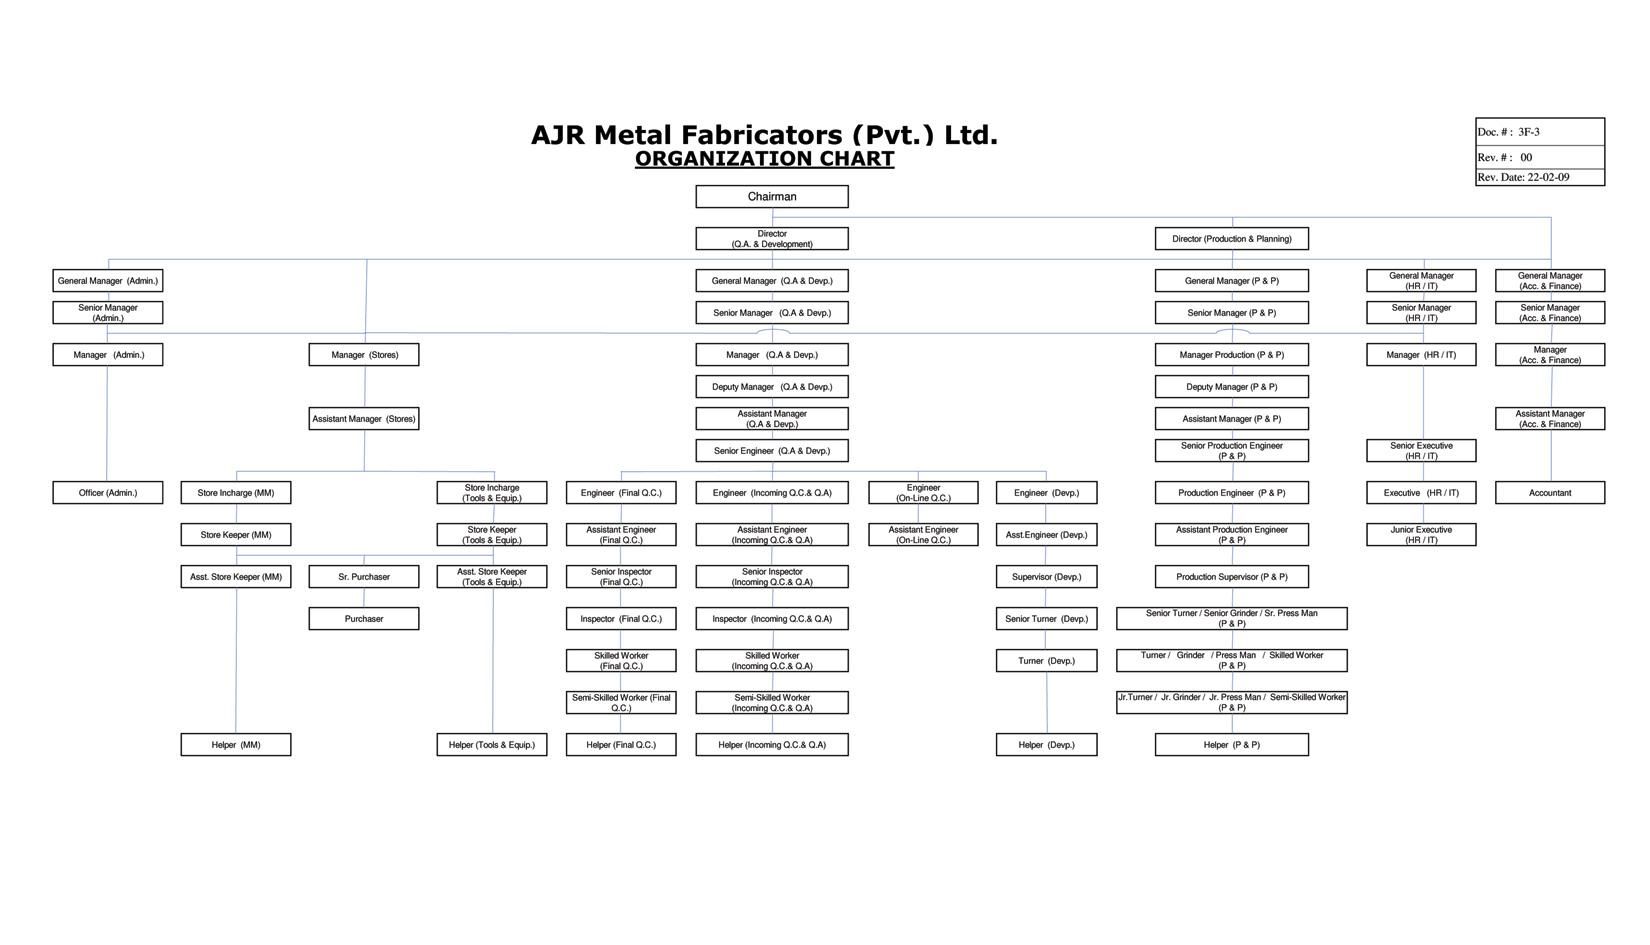 AJR Organization Chart